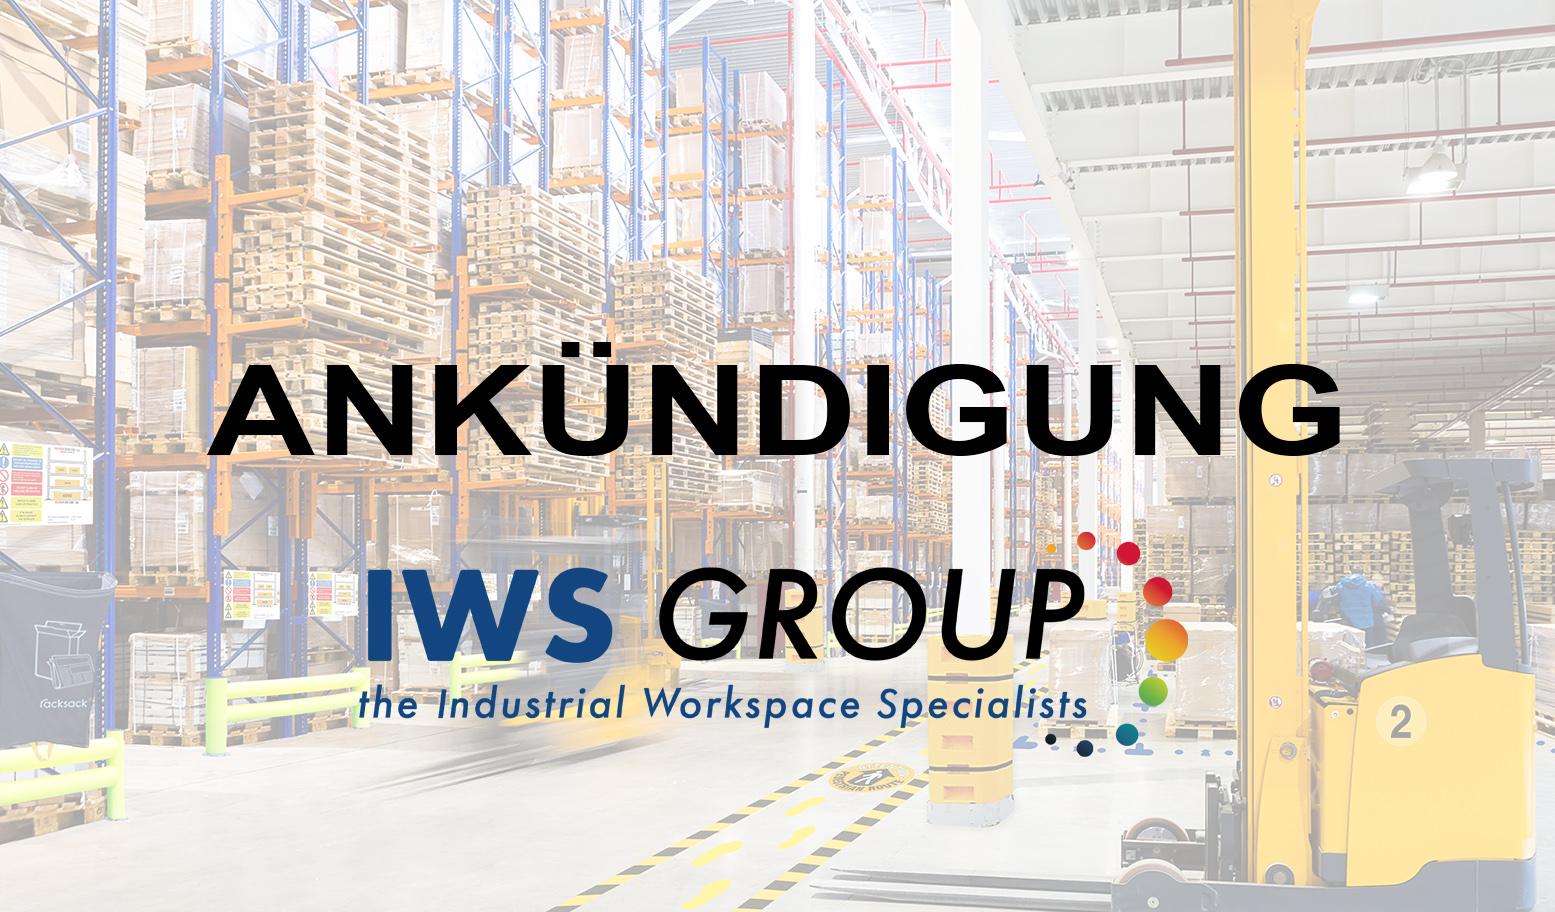 Ankündigung bezüglich IWS-Gruppe